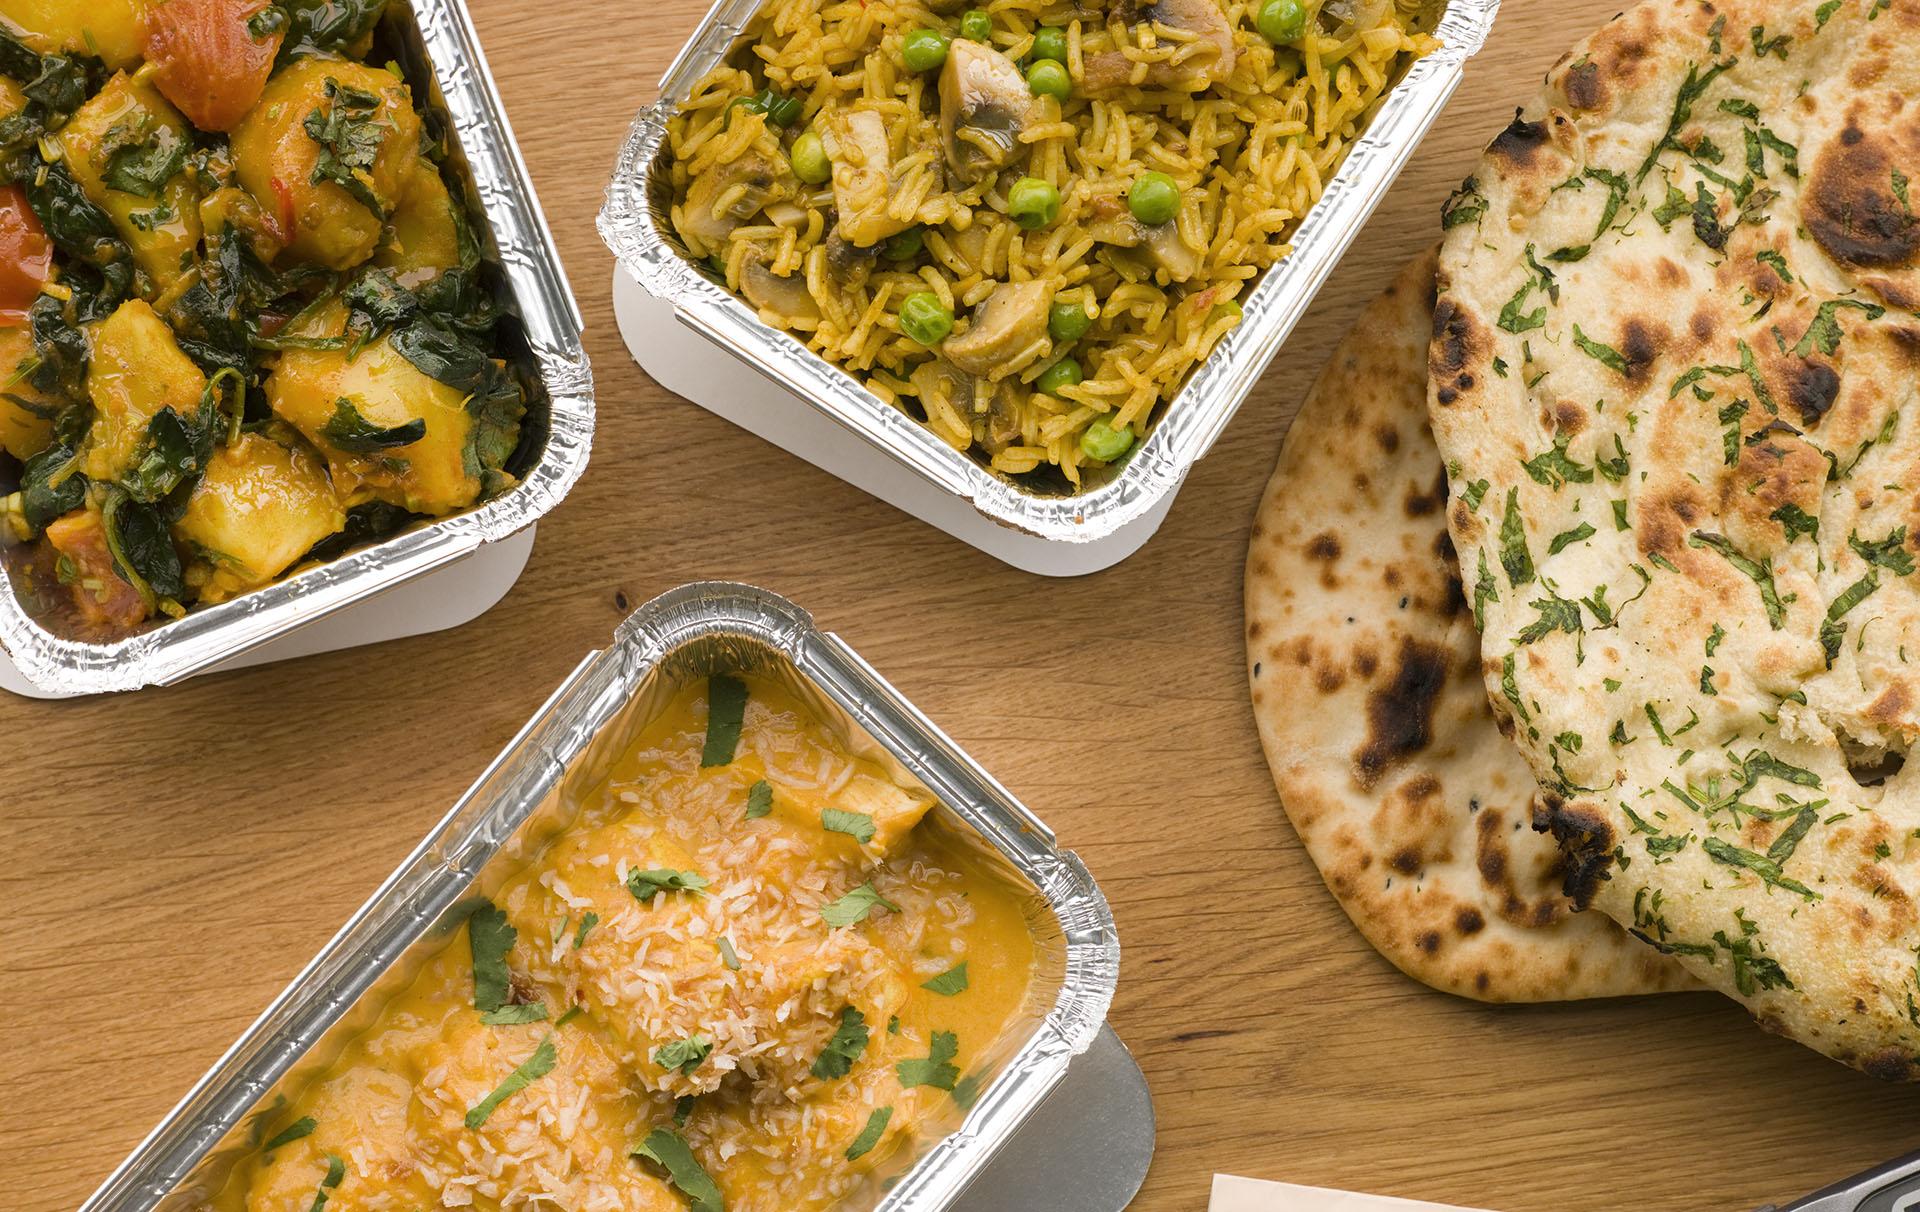 tesco indian meal deal